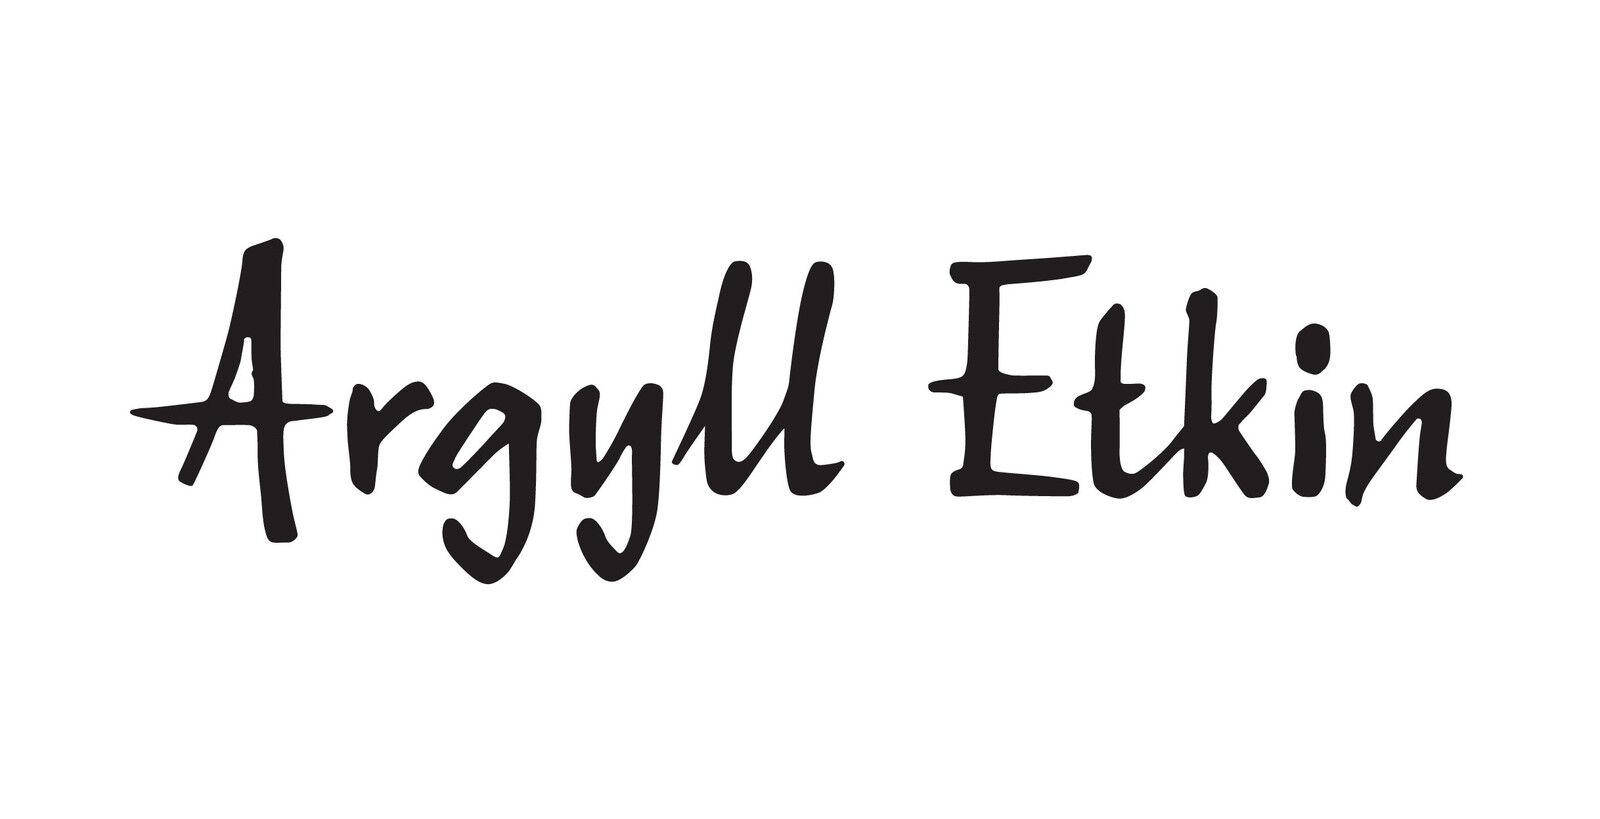 Argyll Etkin